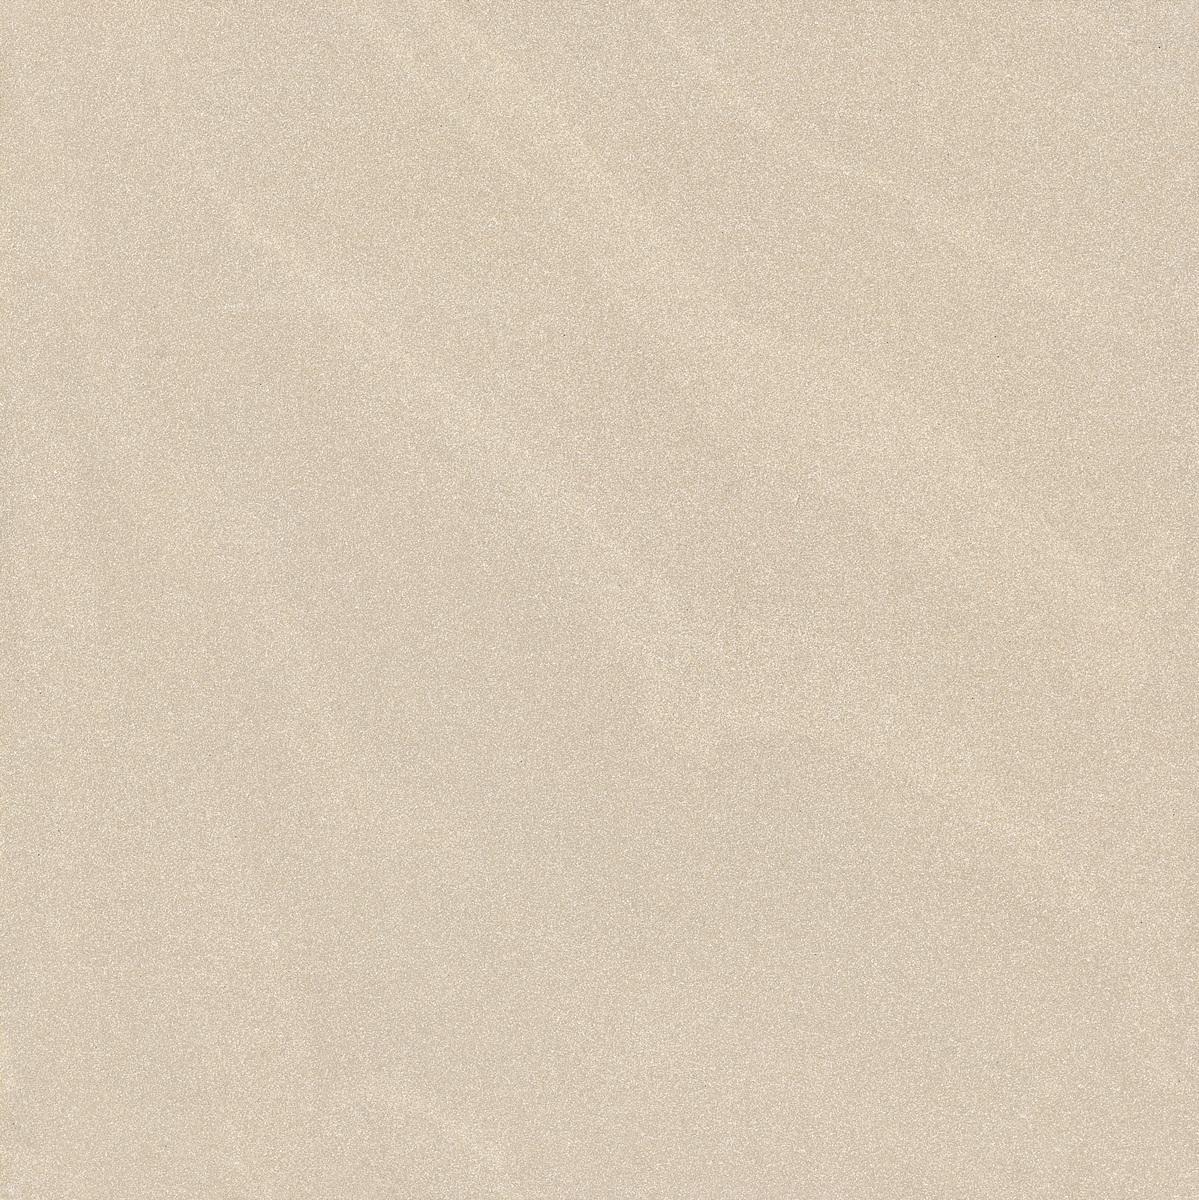 Tiles - PERTH - Matt Ivory 300x600mm (8 pieces)